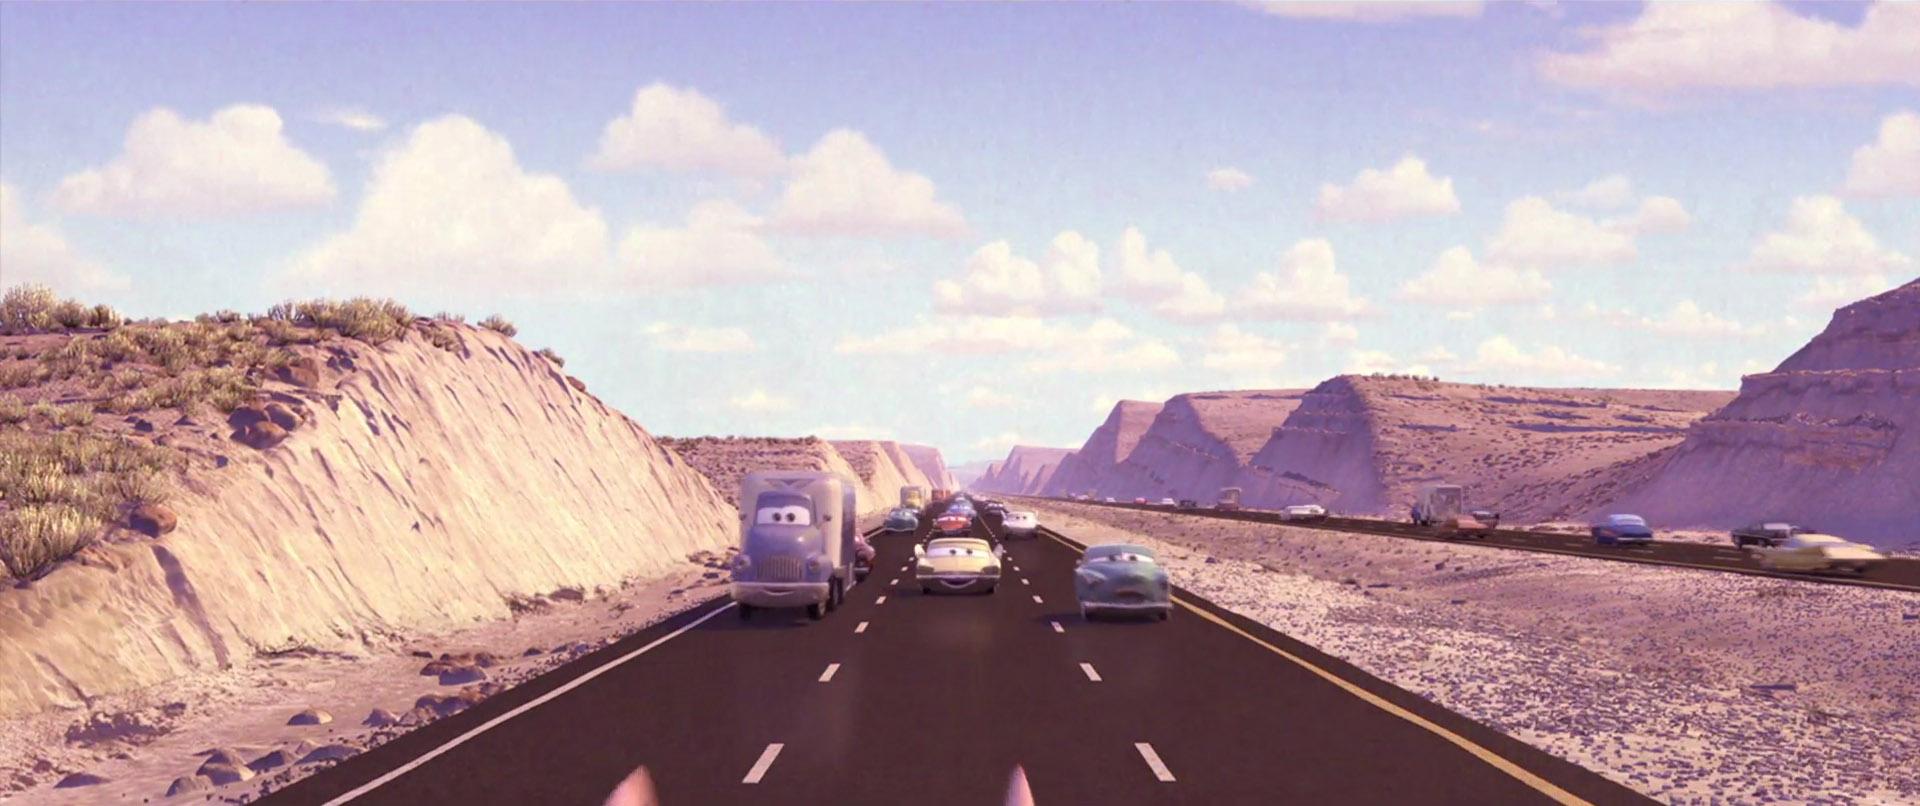 milton calypeer personnage character pixar disney cars